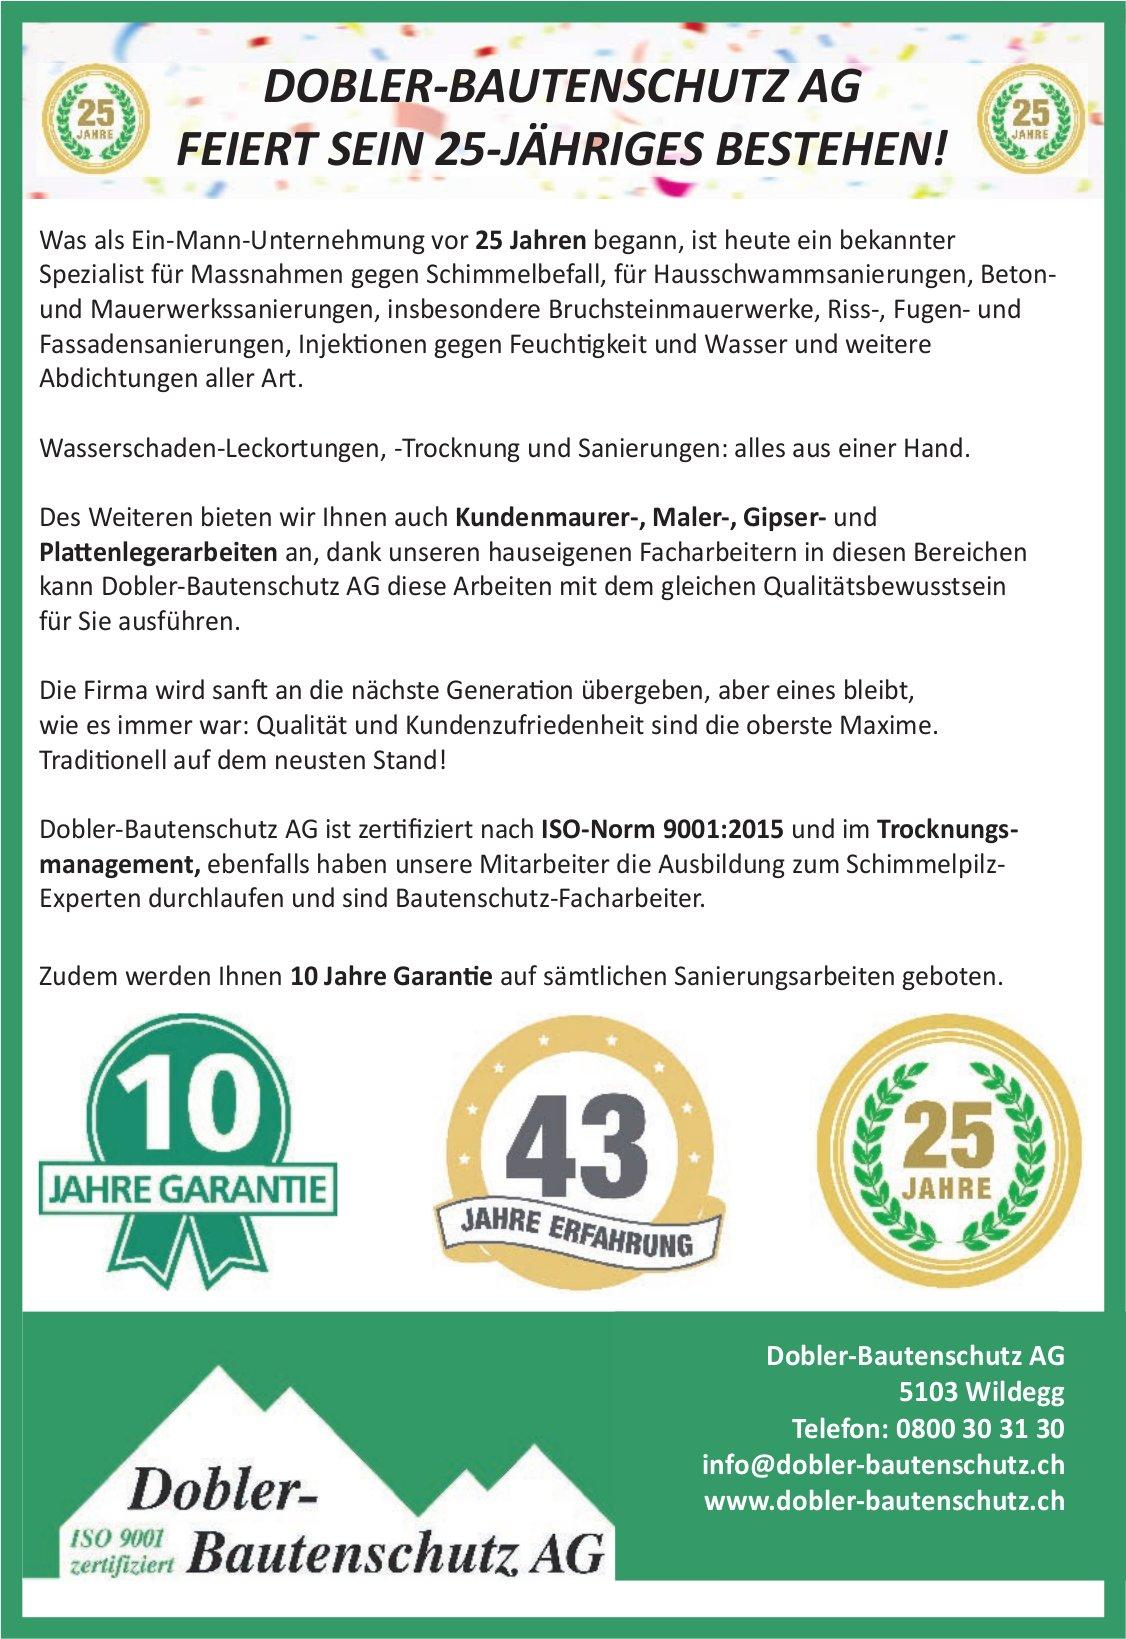 DOBLER-BAUTENSCHUTZ AG FEIERT SEIN 25-JÄHRIGES BESTEHEN!